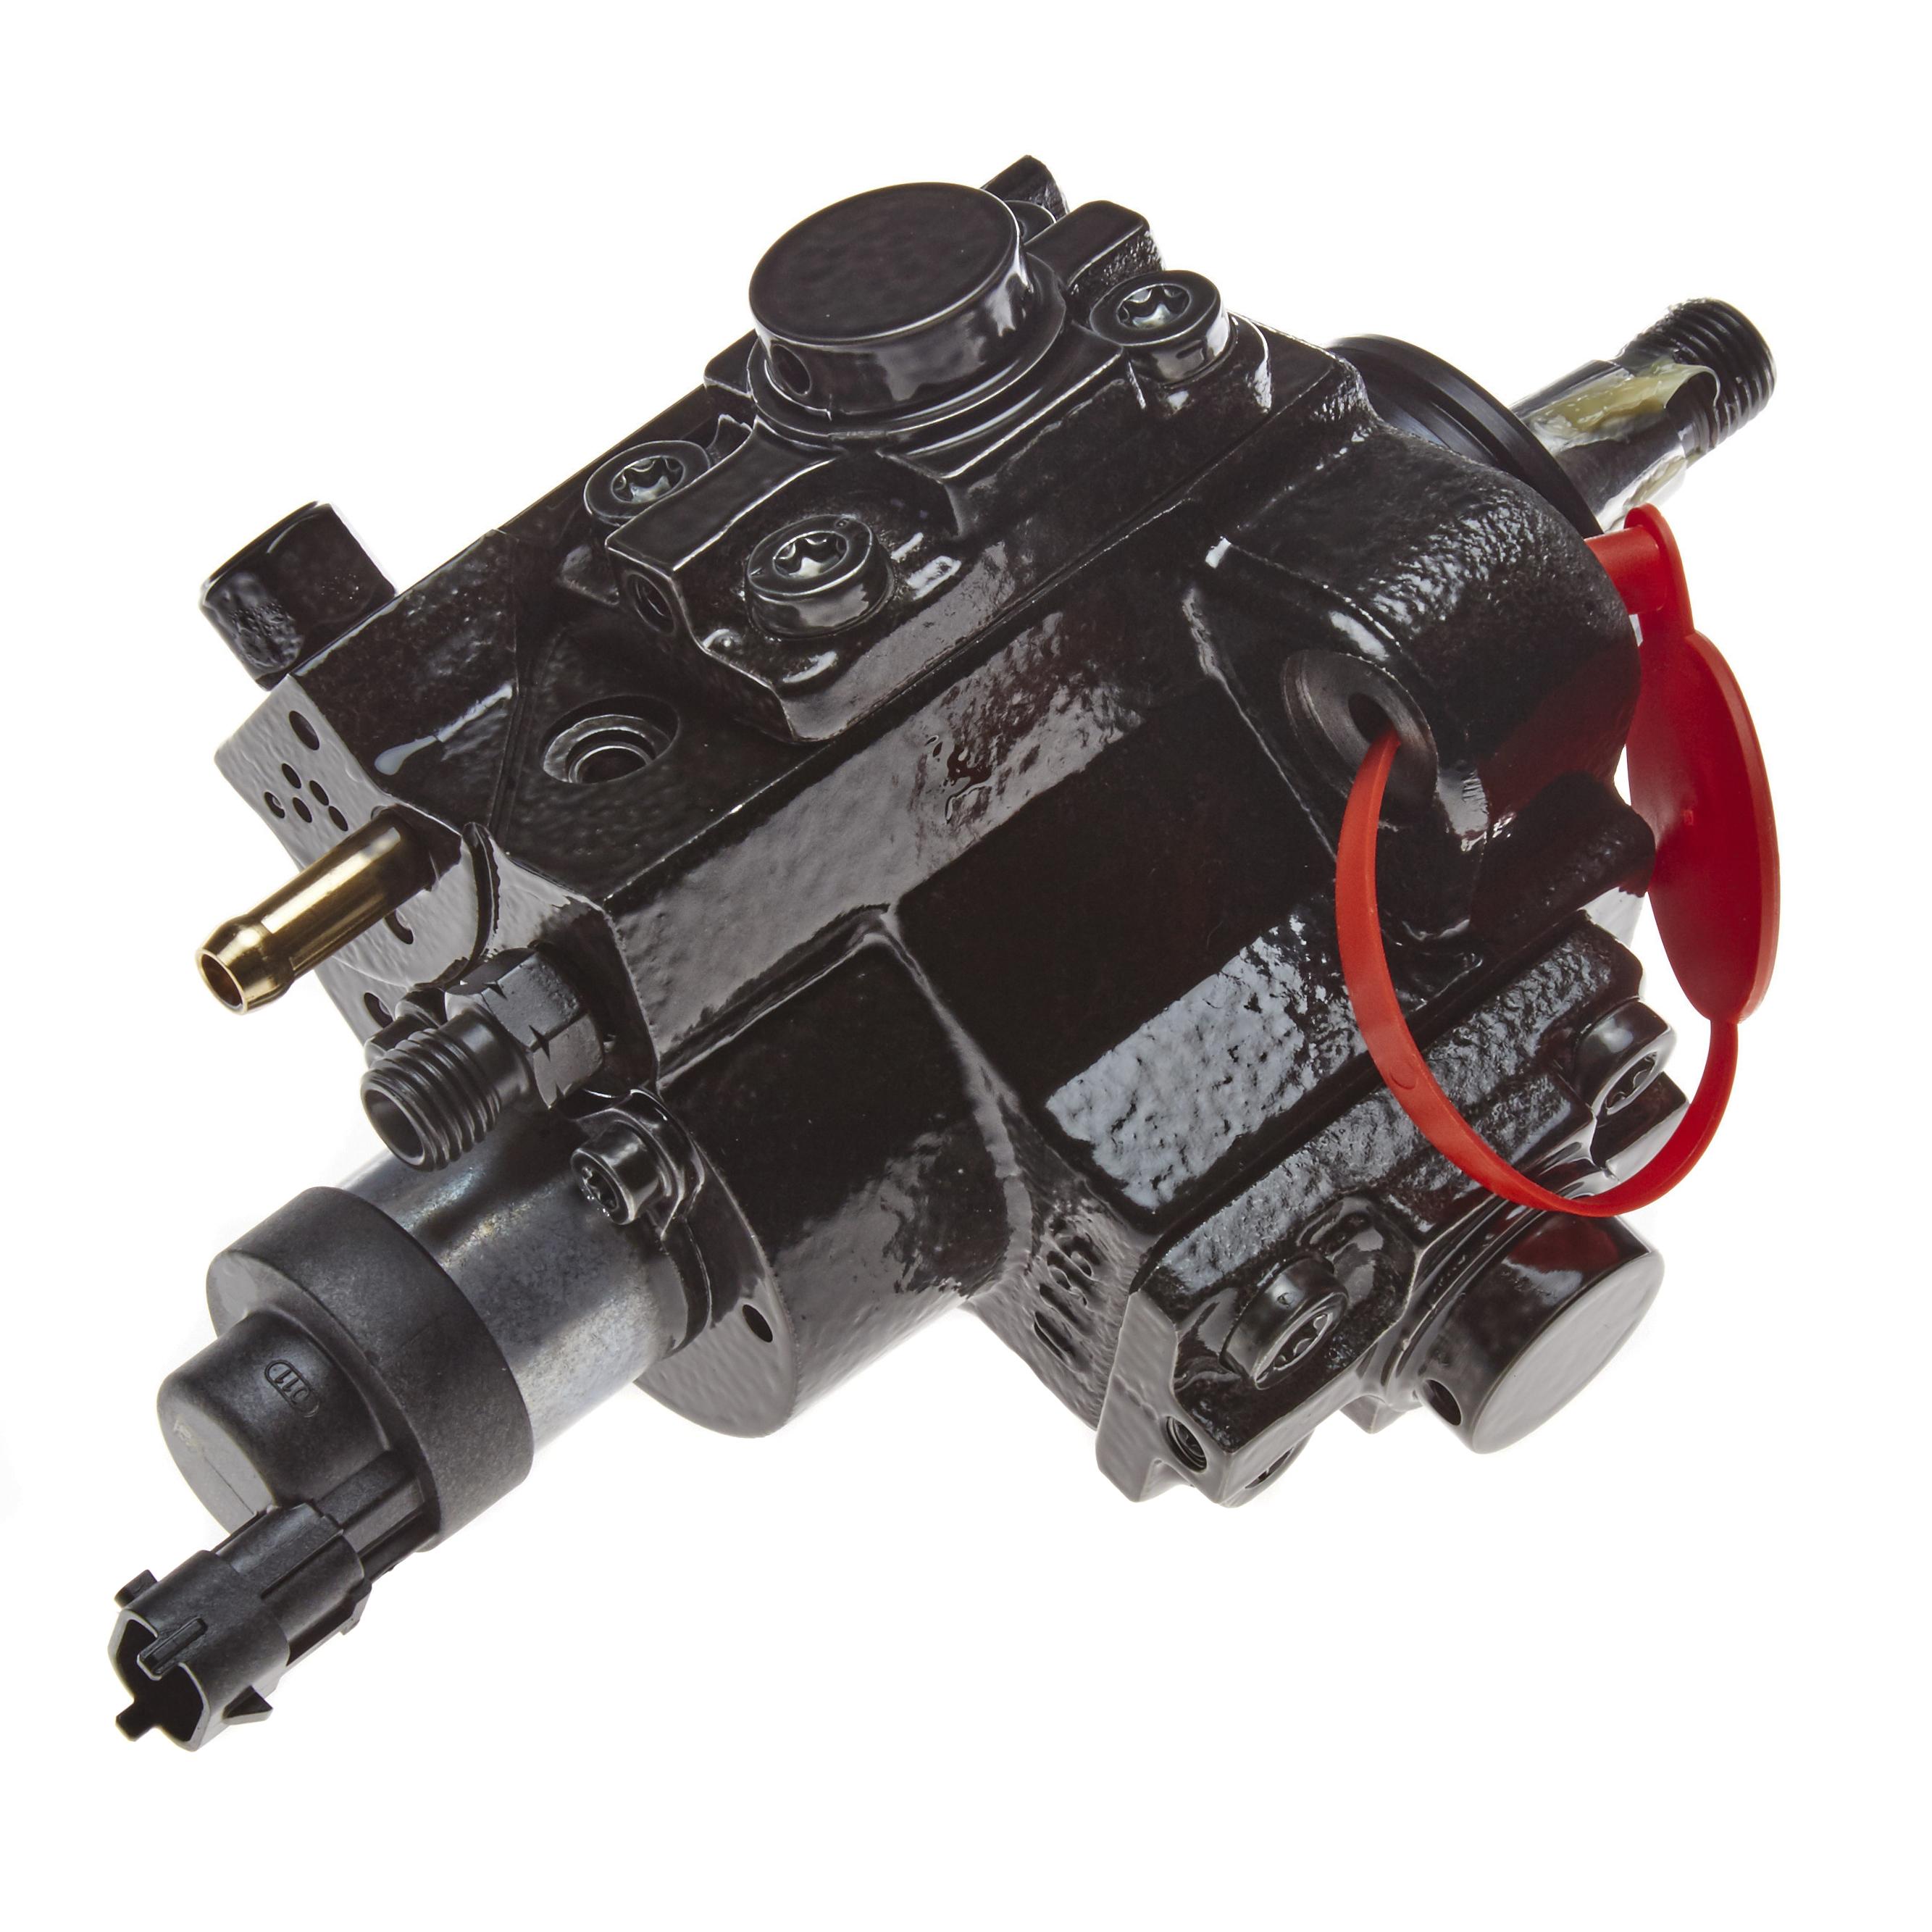 diesel fuel injection pump common rail high pressure bosch bx 986437085 ebay. Black Bedroom Furniture Sets. Home Design Ideas